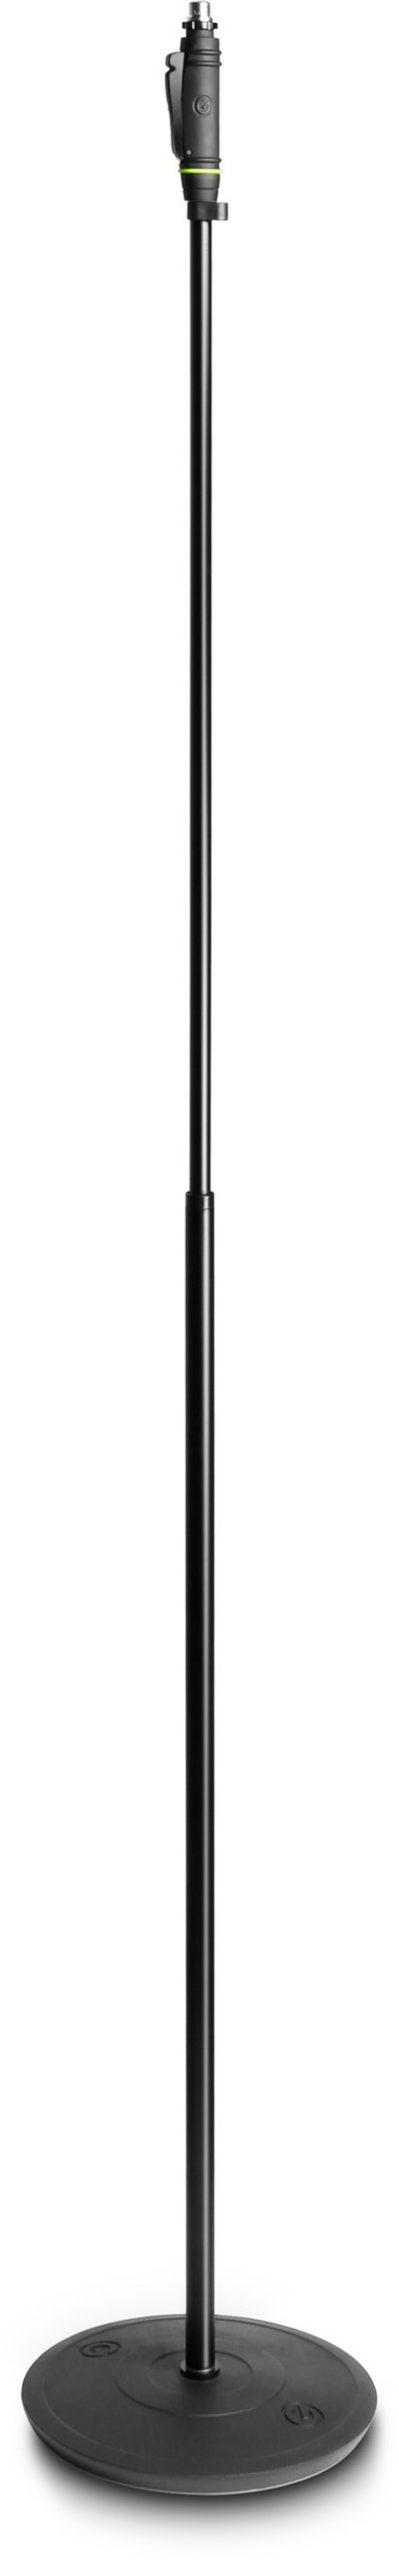 Gravity MS 231 HB - stojak na mikrofon